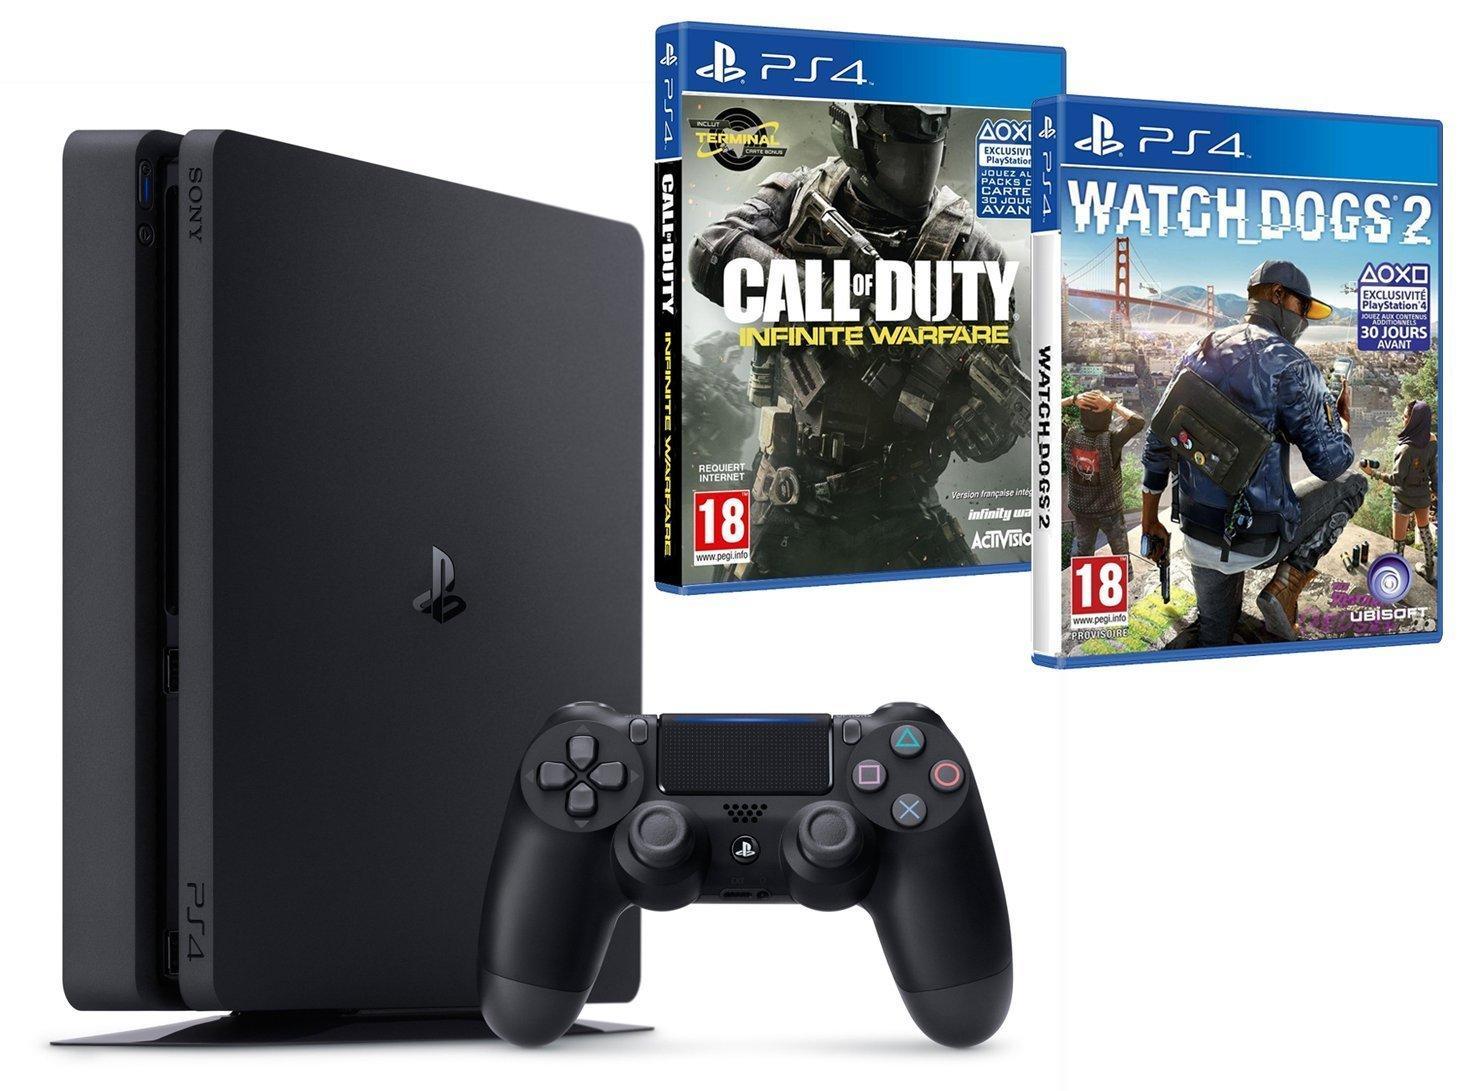 Console Sony PS4 Slim 500 Go + Watch Dogs 2 + Call of Duty Infinite Warfare